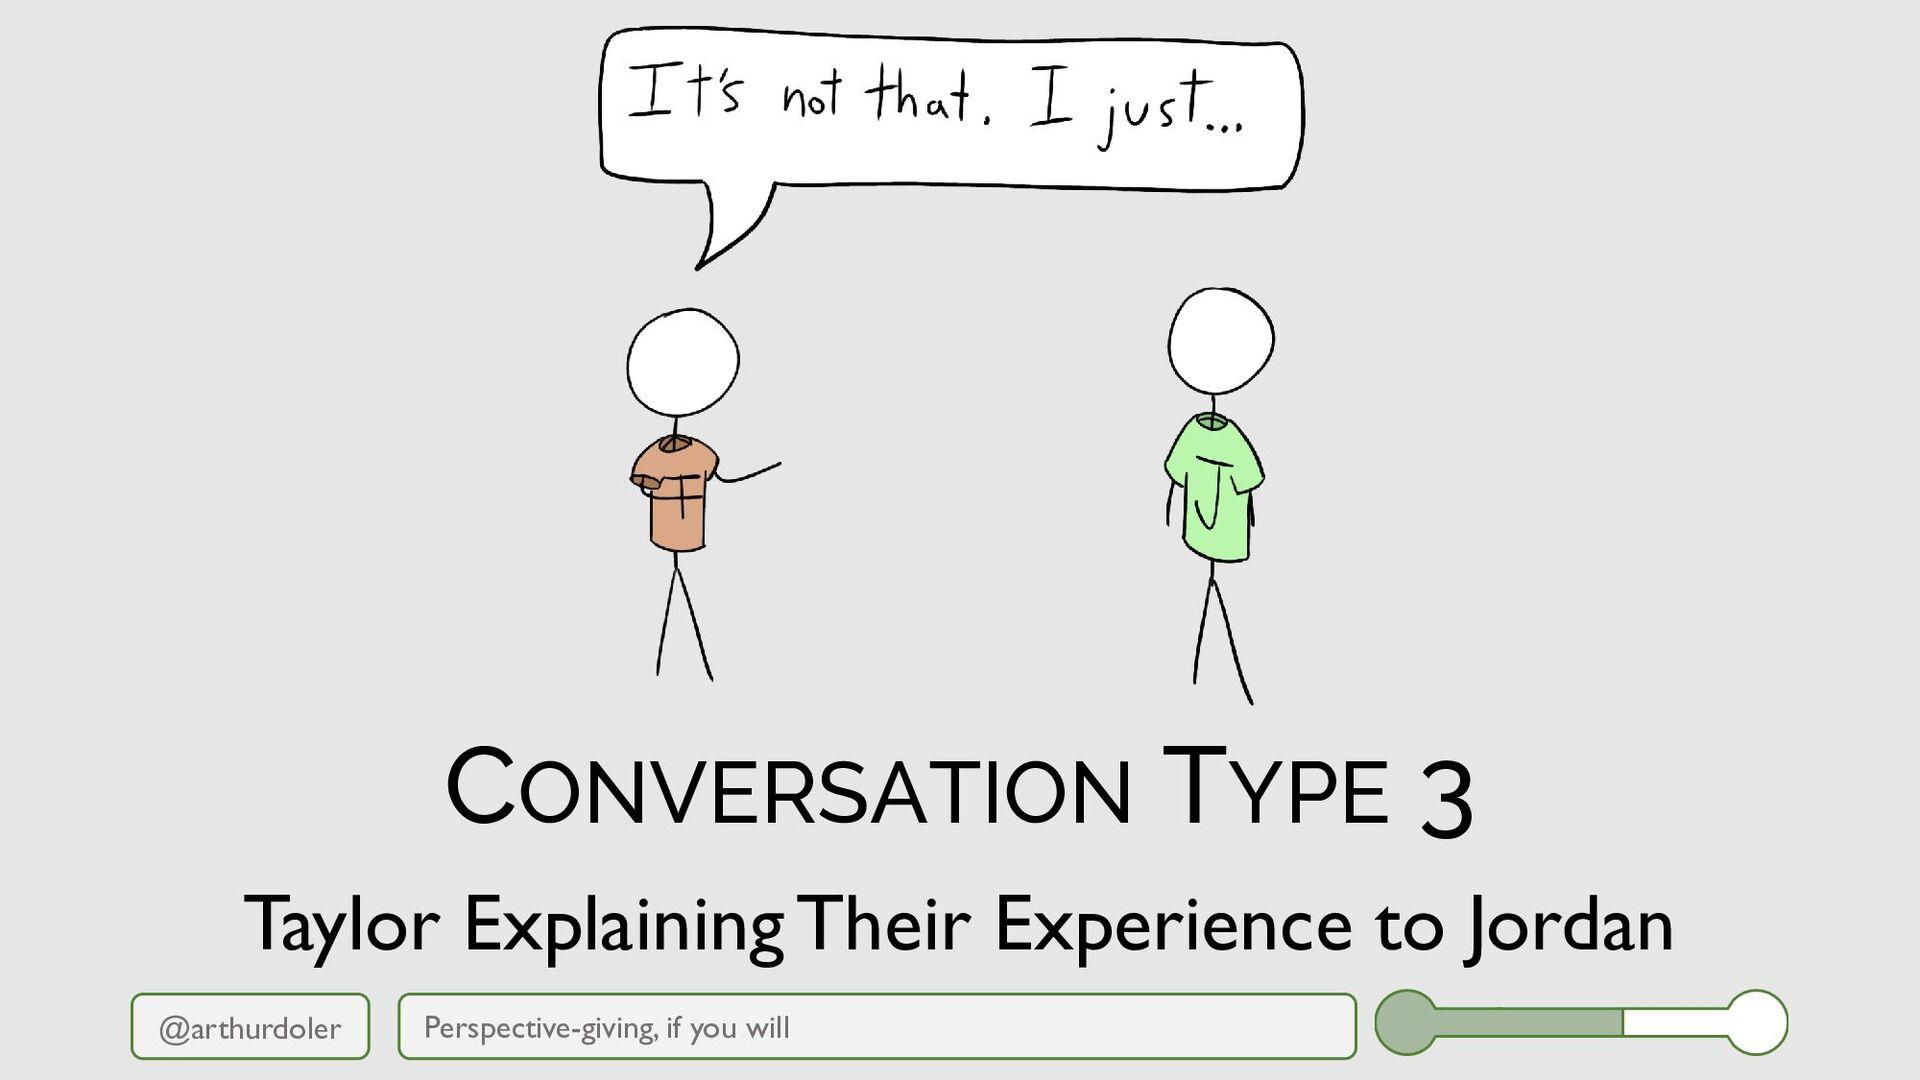 @arthurdoler CONVERSATION TYPE 3 Perspective-gi...